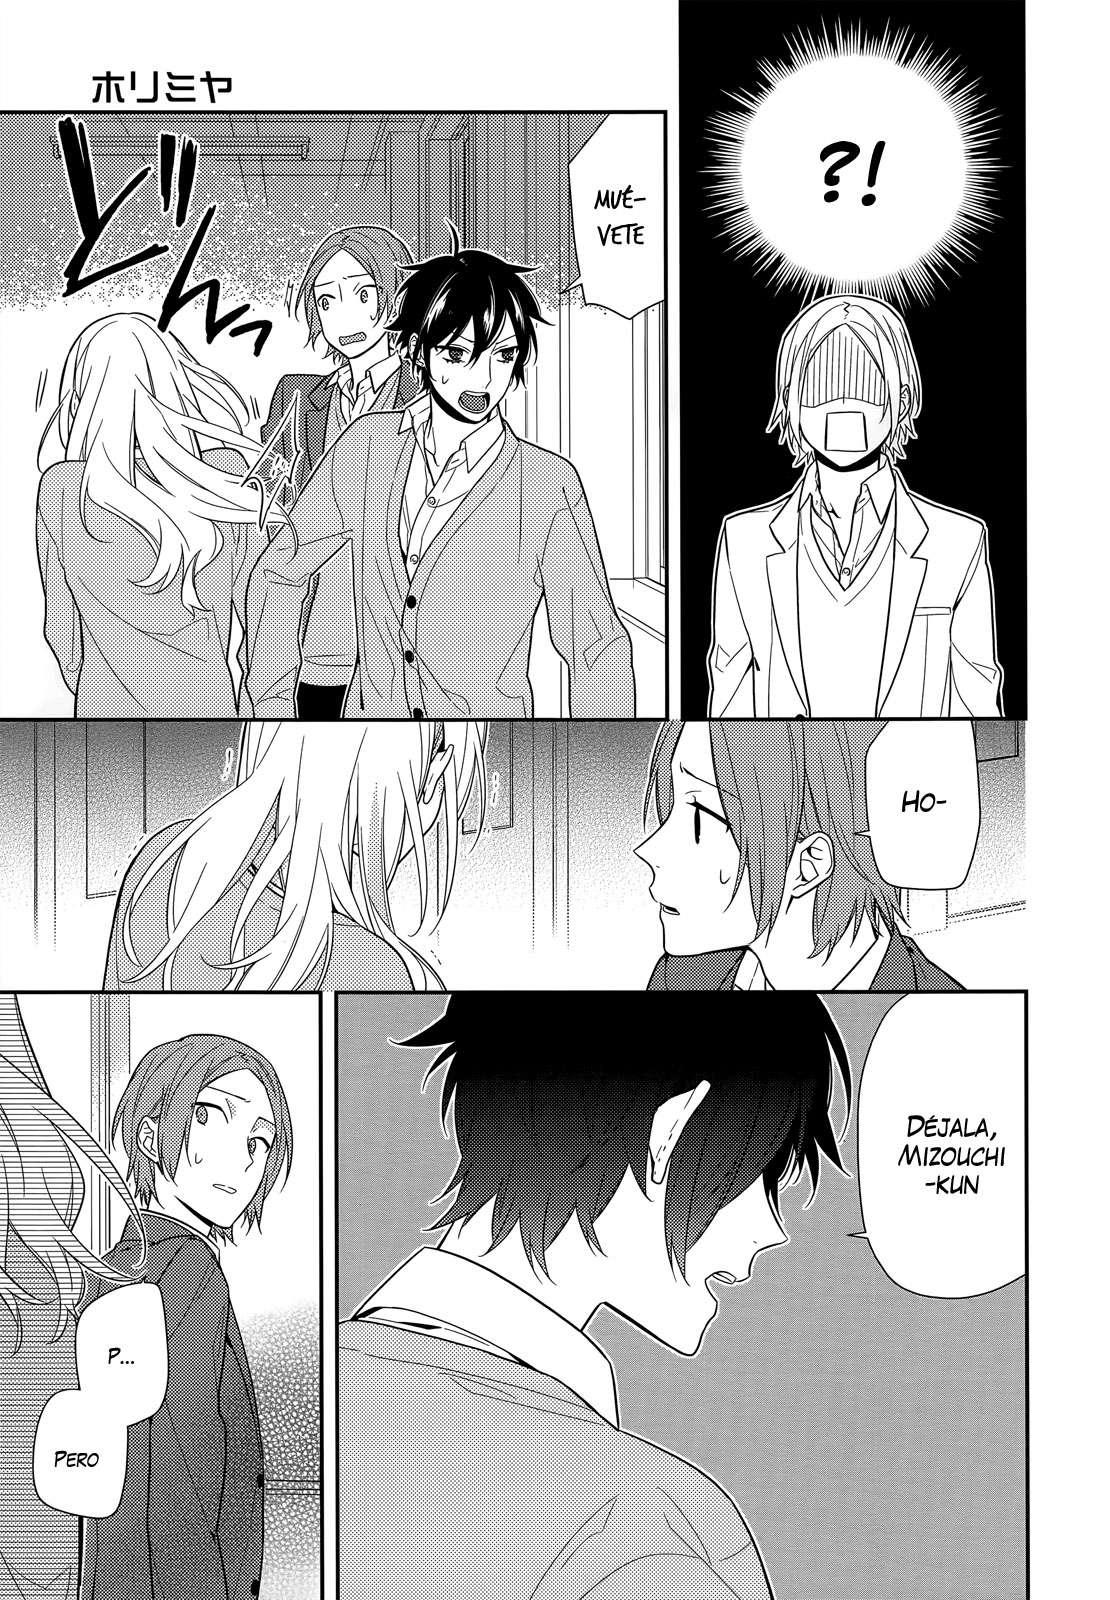 http://c5.ninemanga.com/es_manga/19/1043/414671/73b6207c290aeb621eb5e8d1e931c686.jpg Page 16